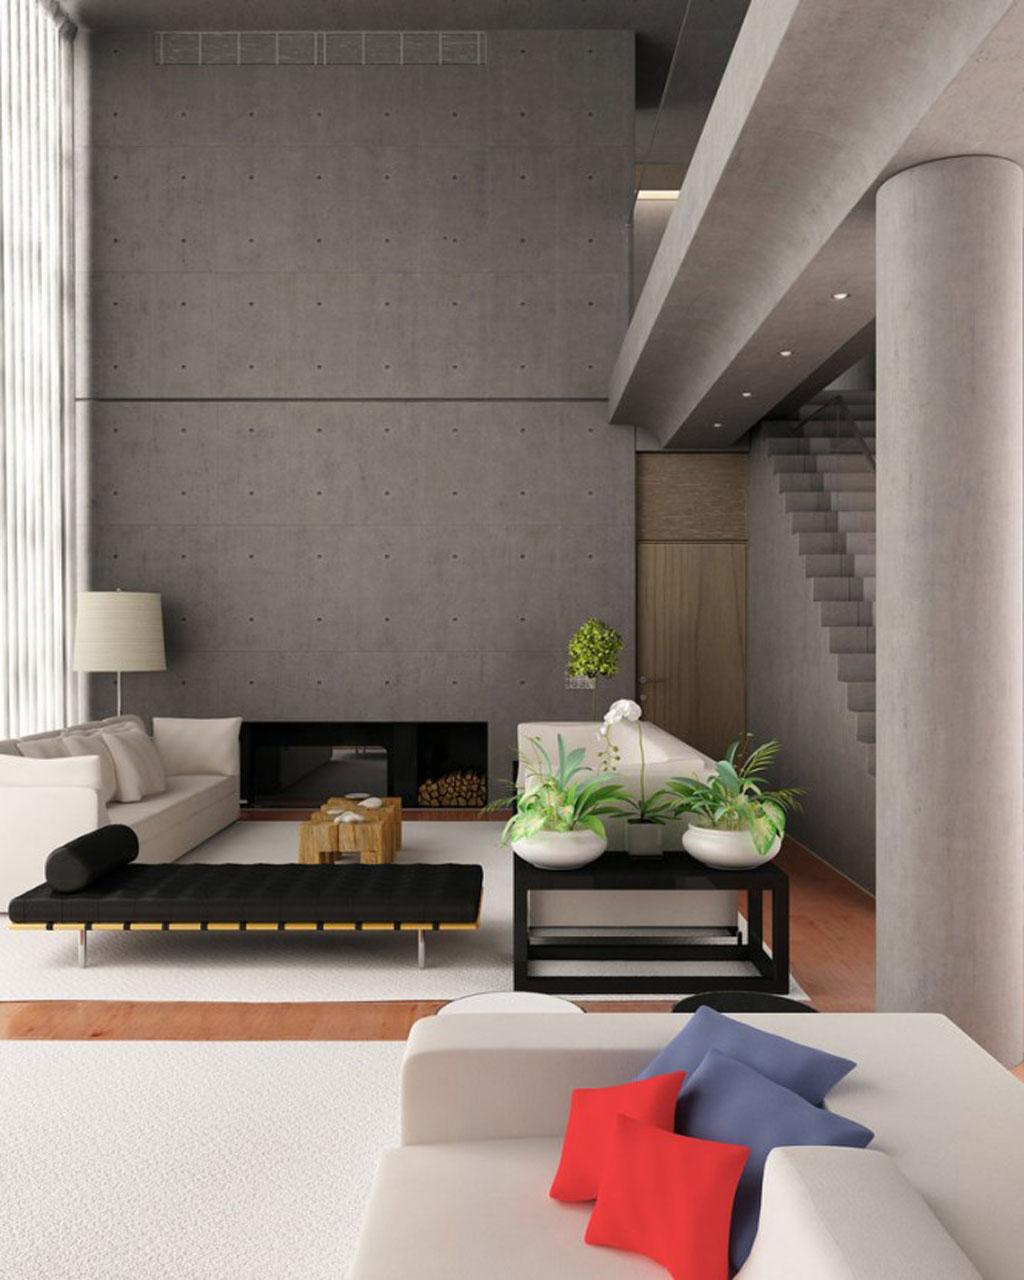 37 Stylish Design Pictures: Decoration Design